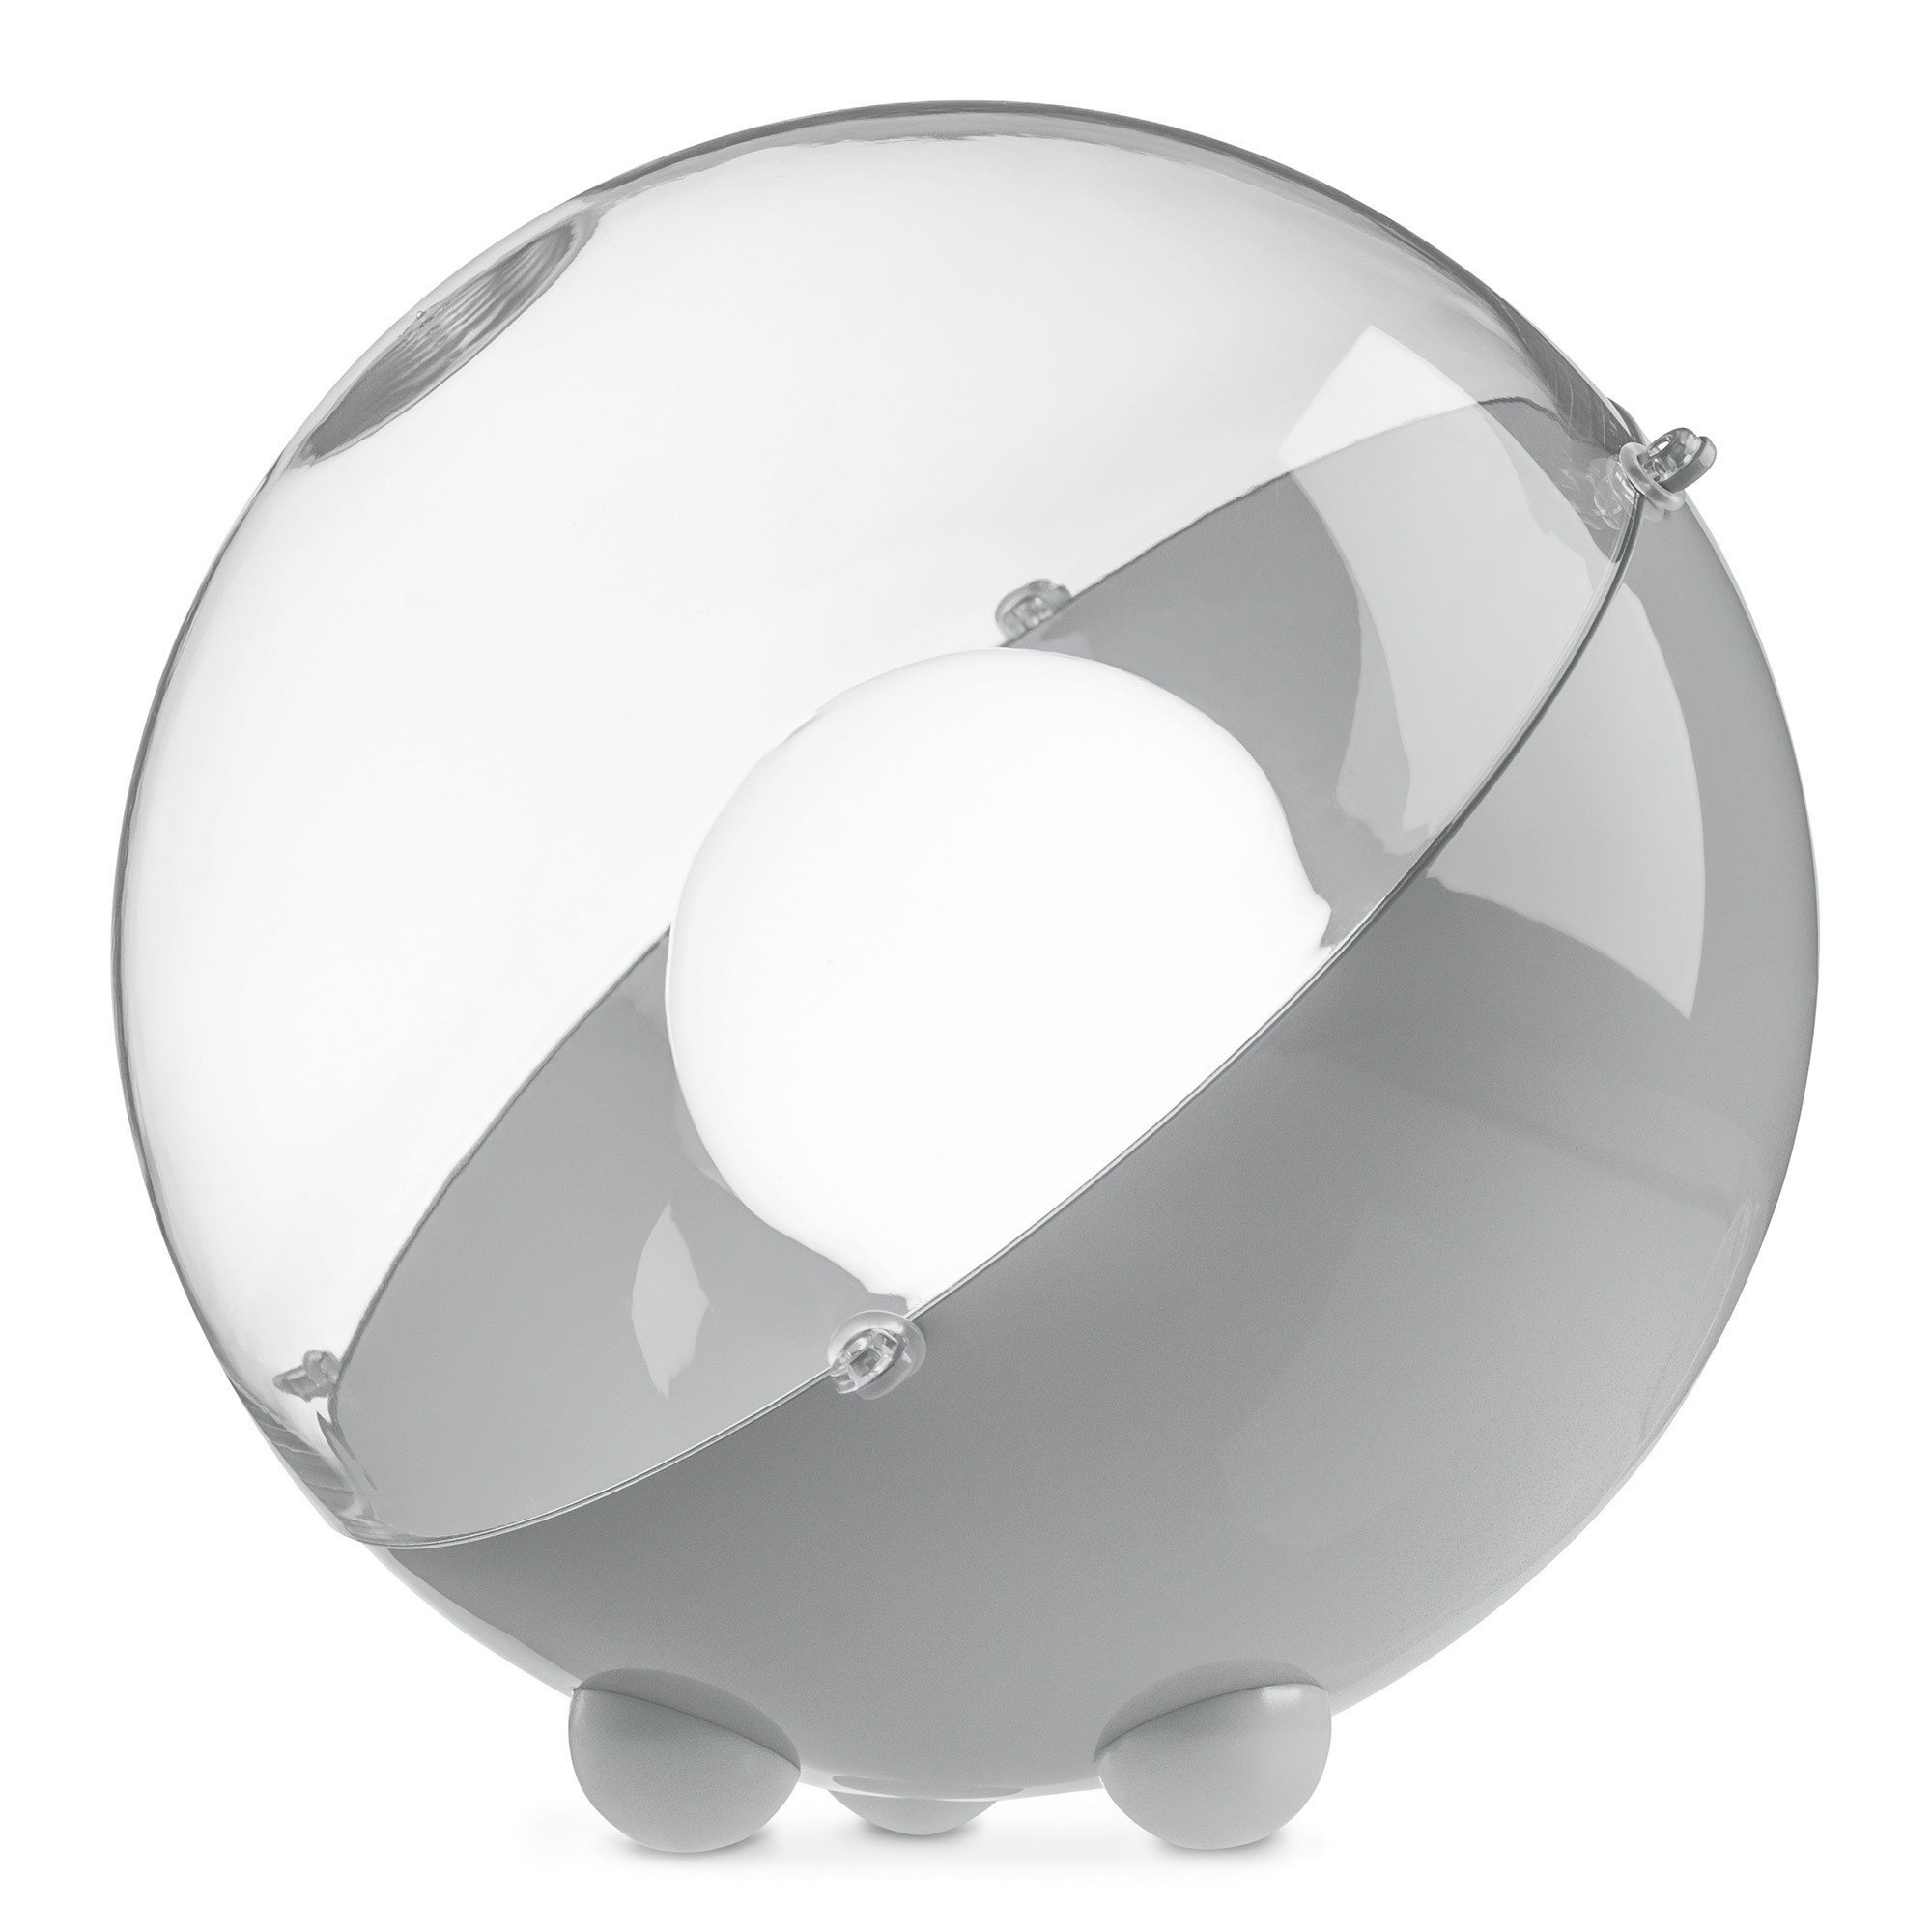 Lampa podłogowa Orion szara bbb